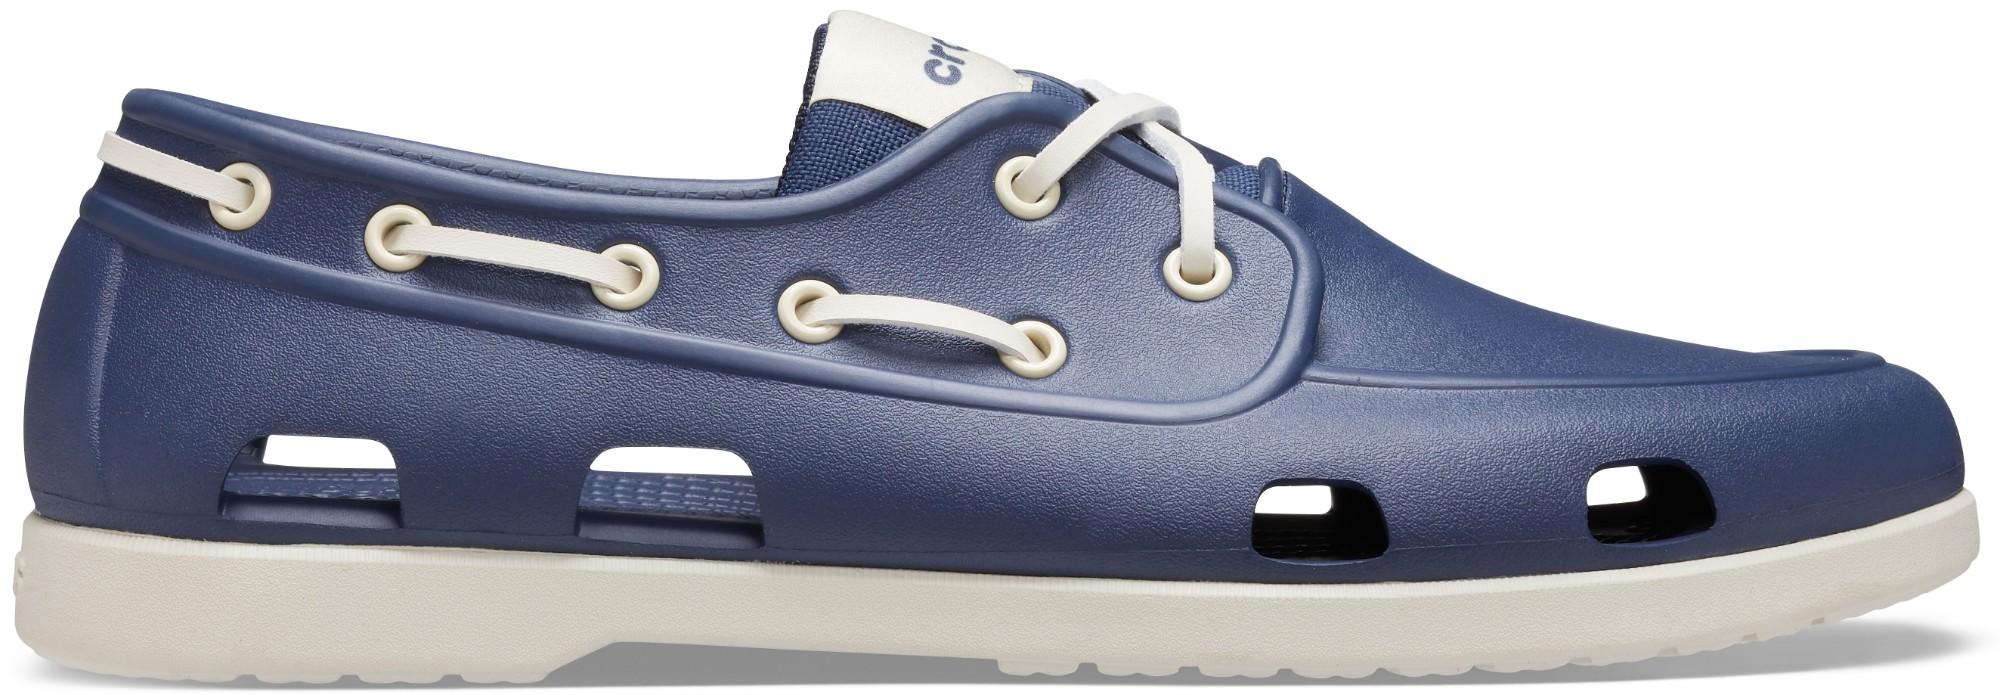 Crocs™ Classic Boat Shoe Mens Navy/Stucco 45,5